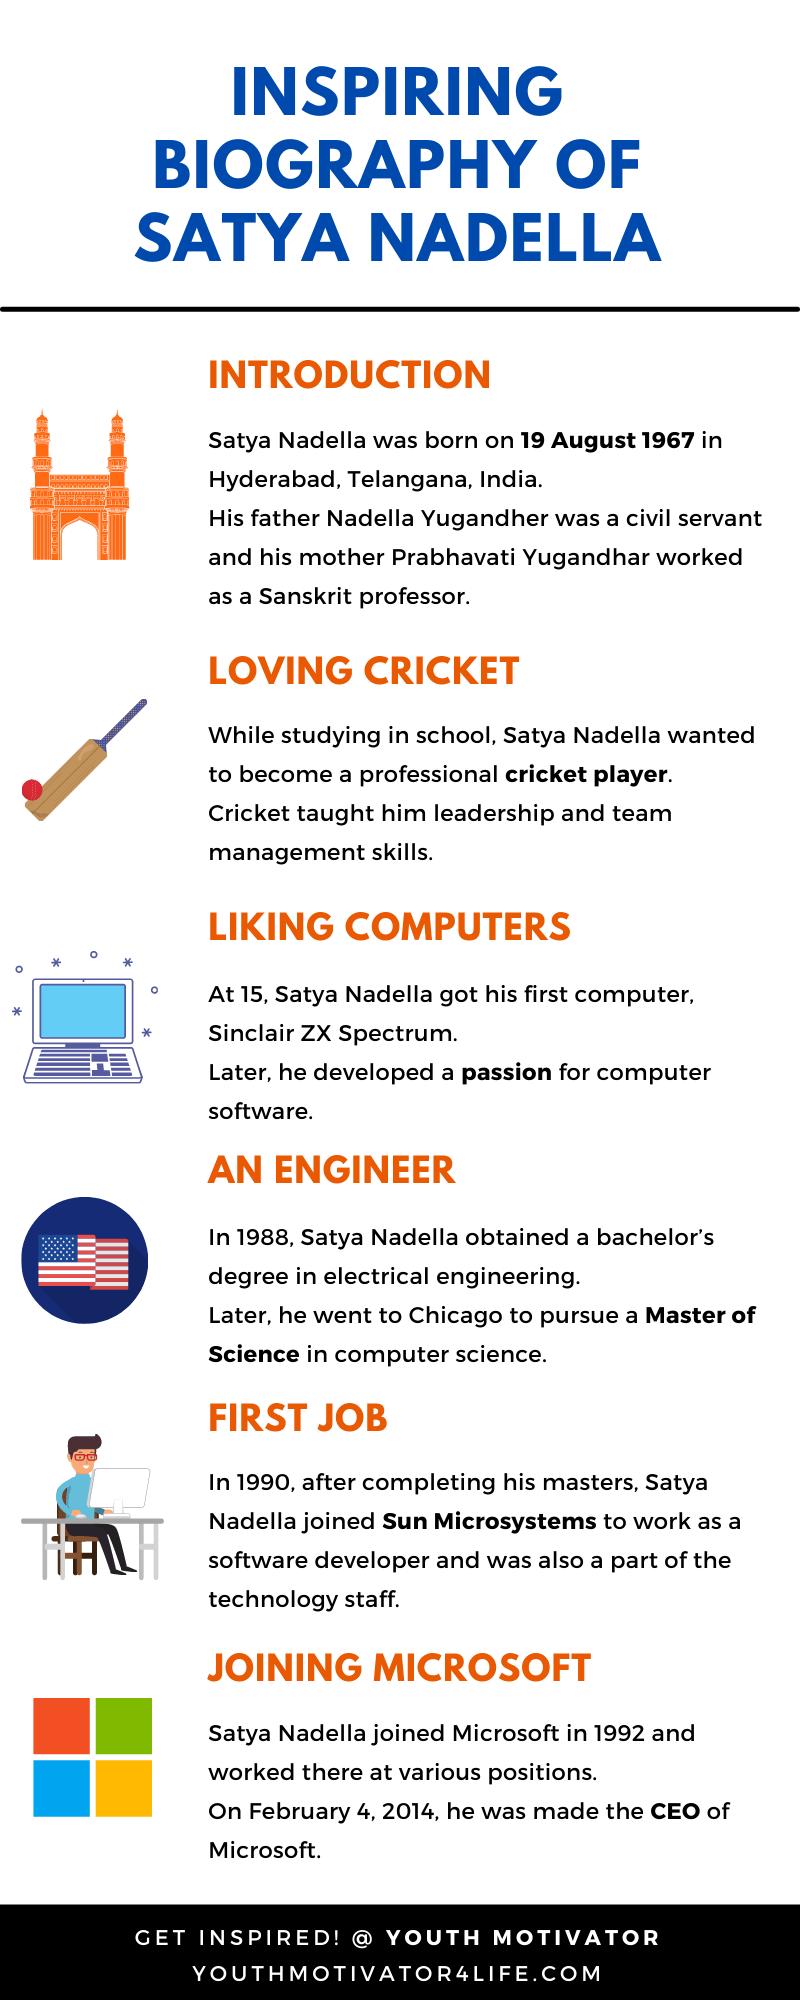 An infographic on biography of Satya Nadella